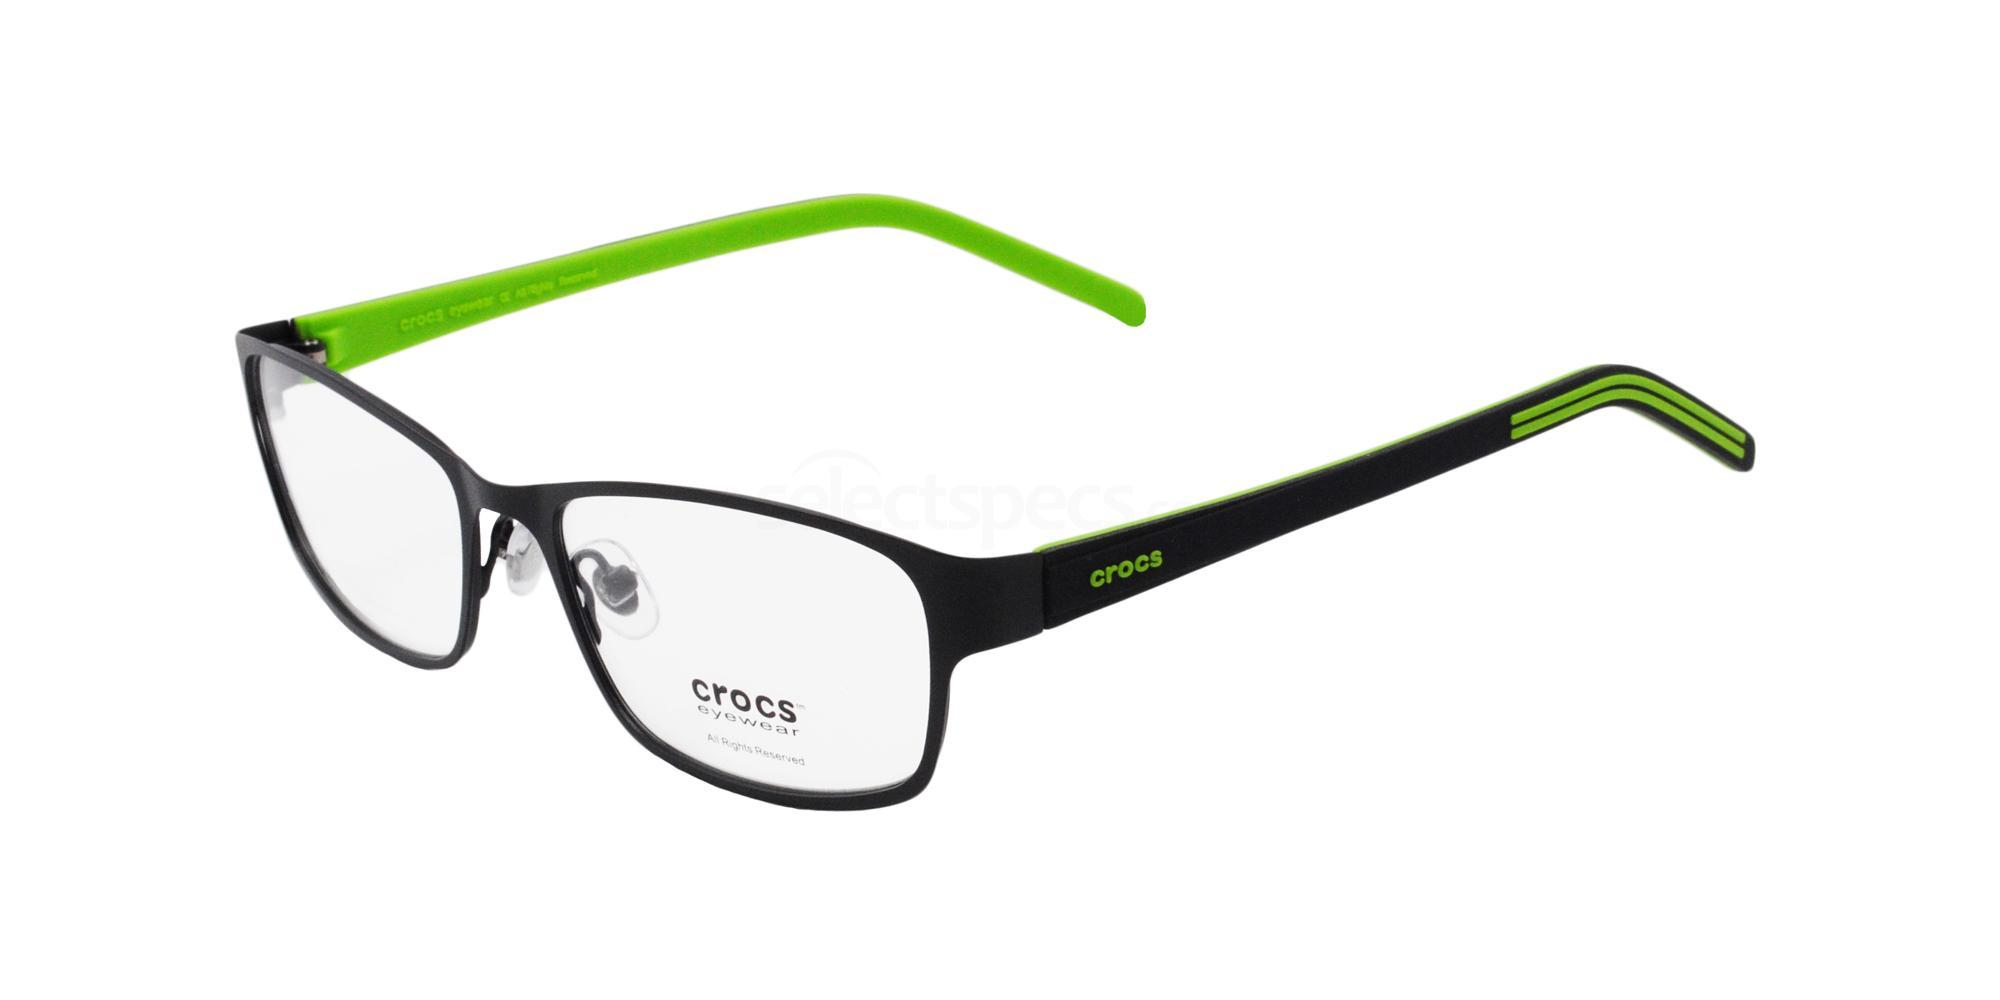 20GN CF 391 Glasses, Crocs Eyewear